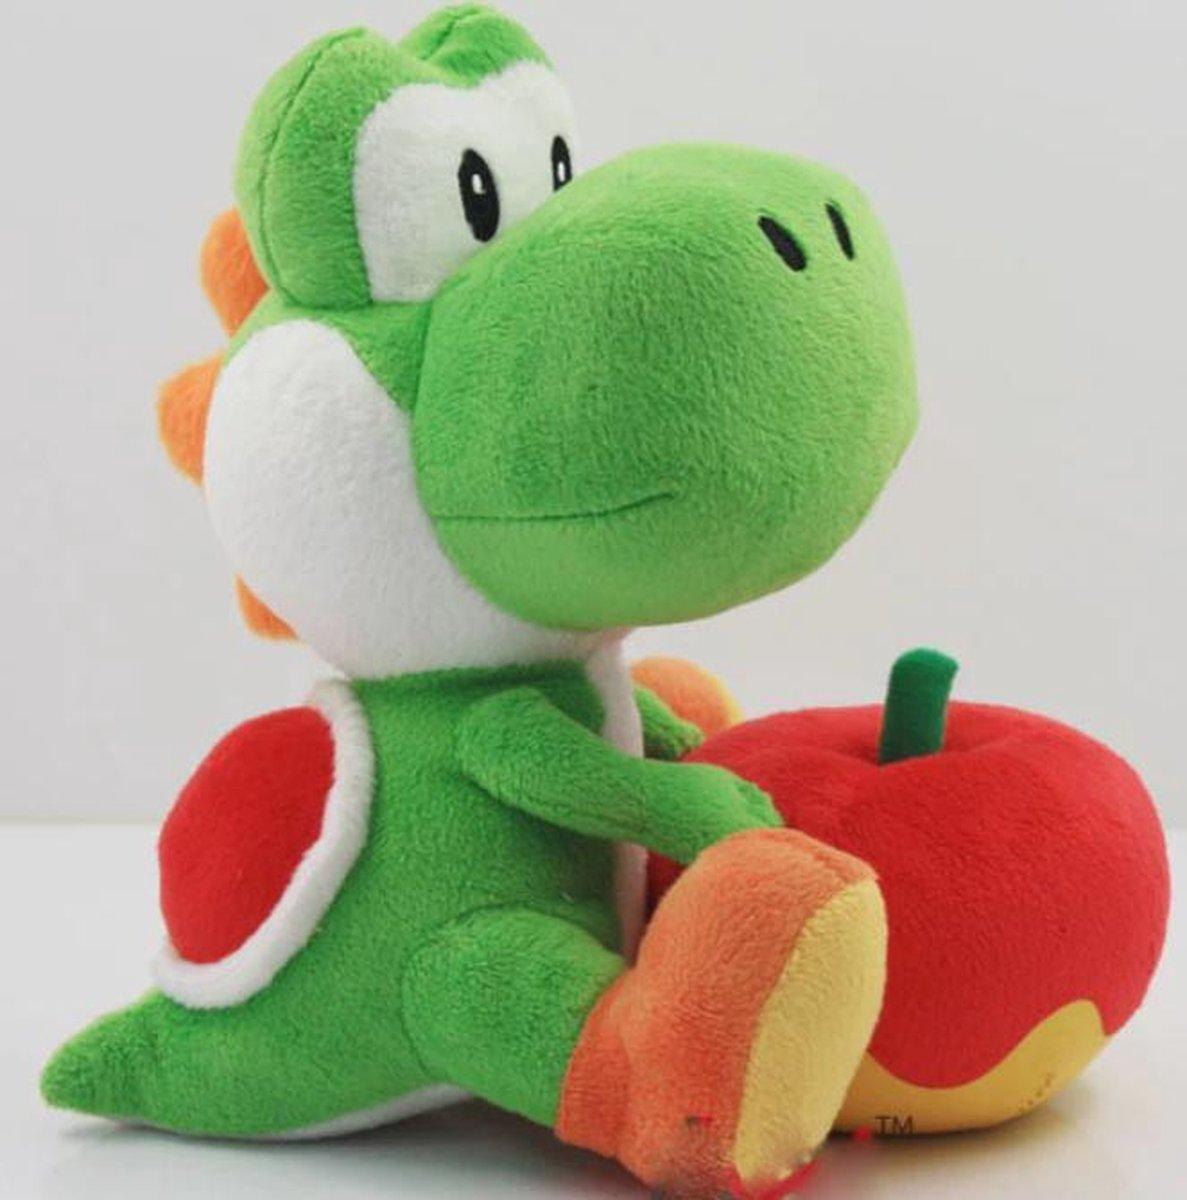 Plushe Yoshi zittend met appel knuffel 20cm - Nintendo - Super Mario bros